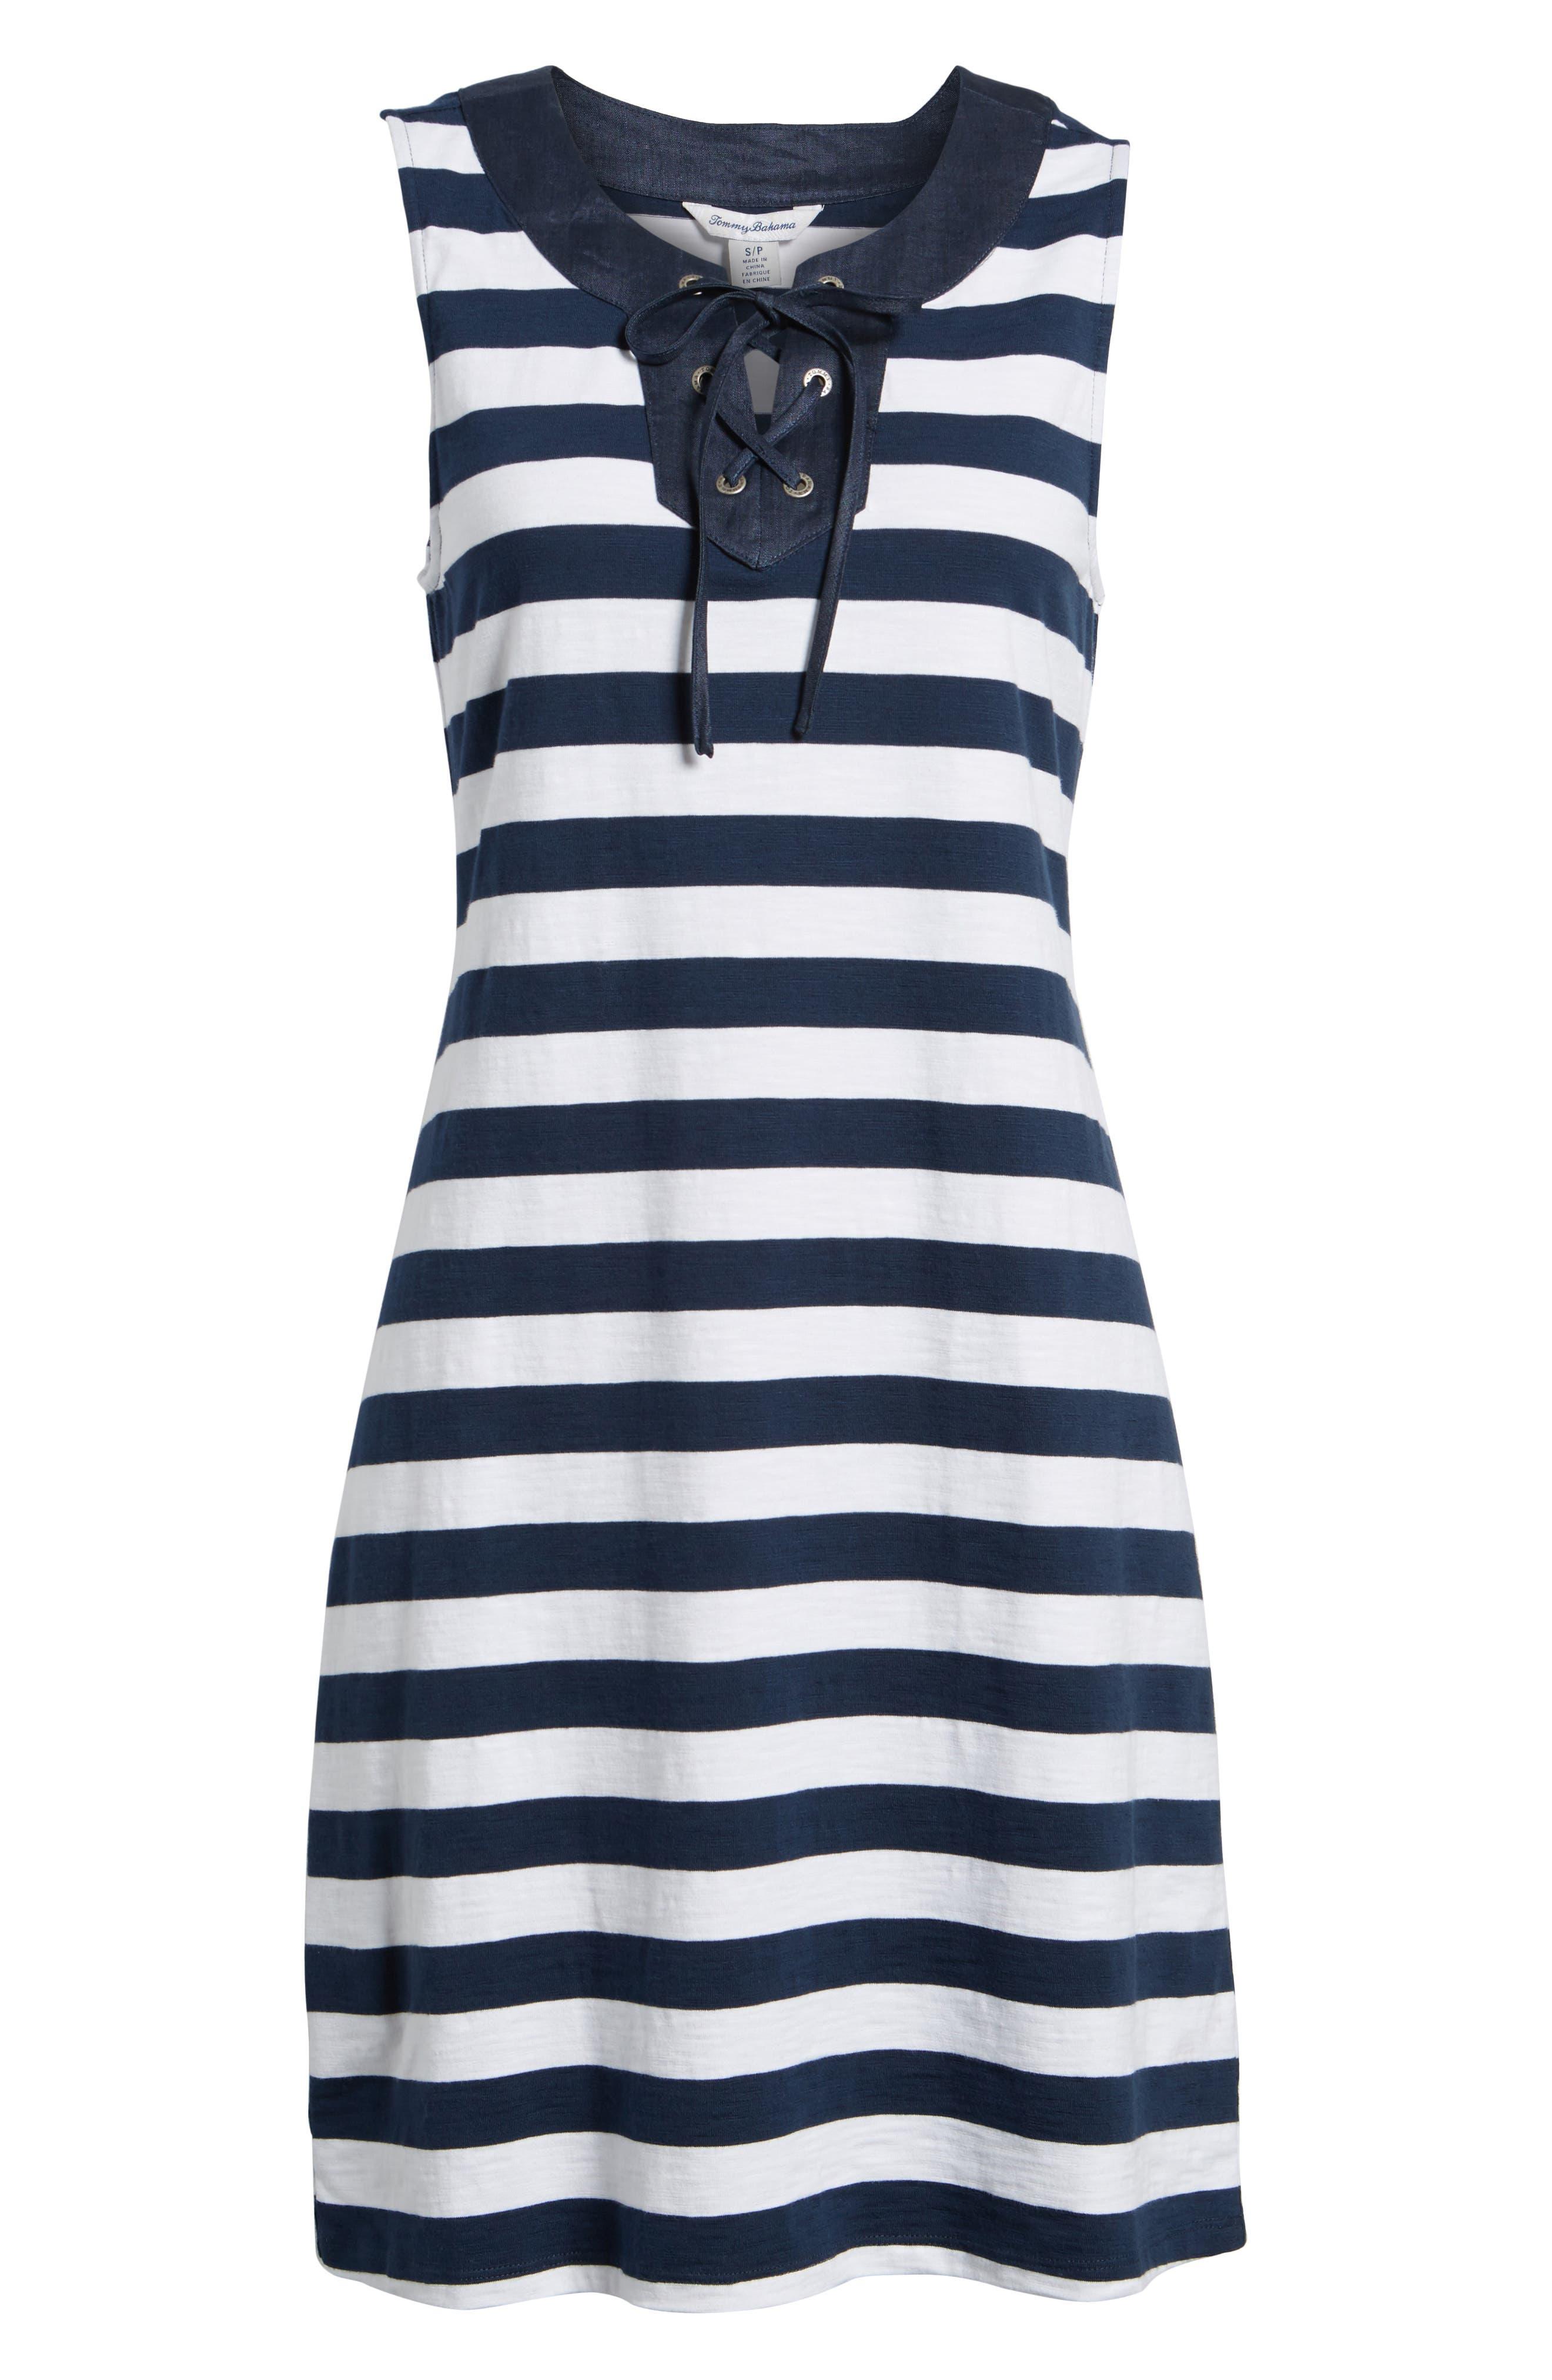 Stripe Right Lace-Up Stretch Cotton Dress,                             Alternate thumbnail 6, color,                             OCEAN DEEP